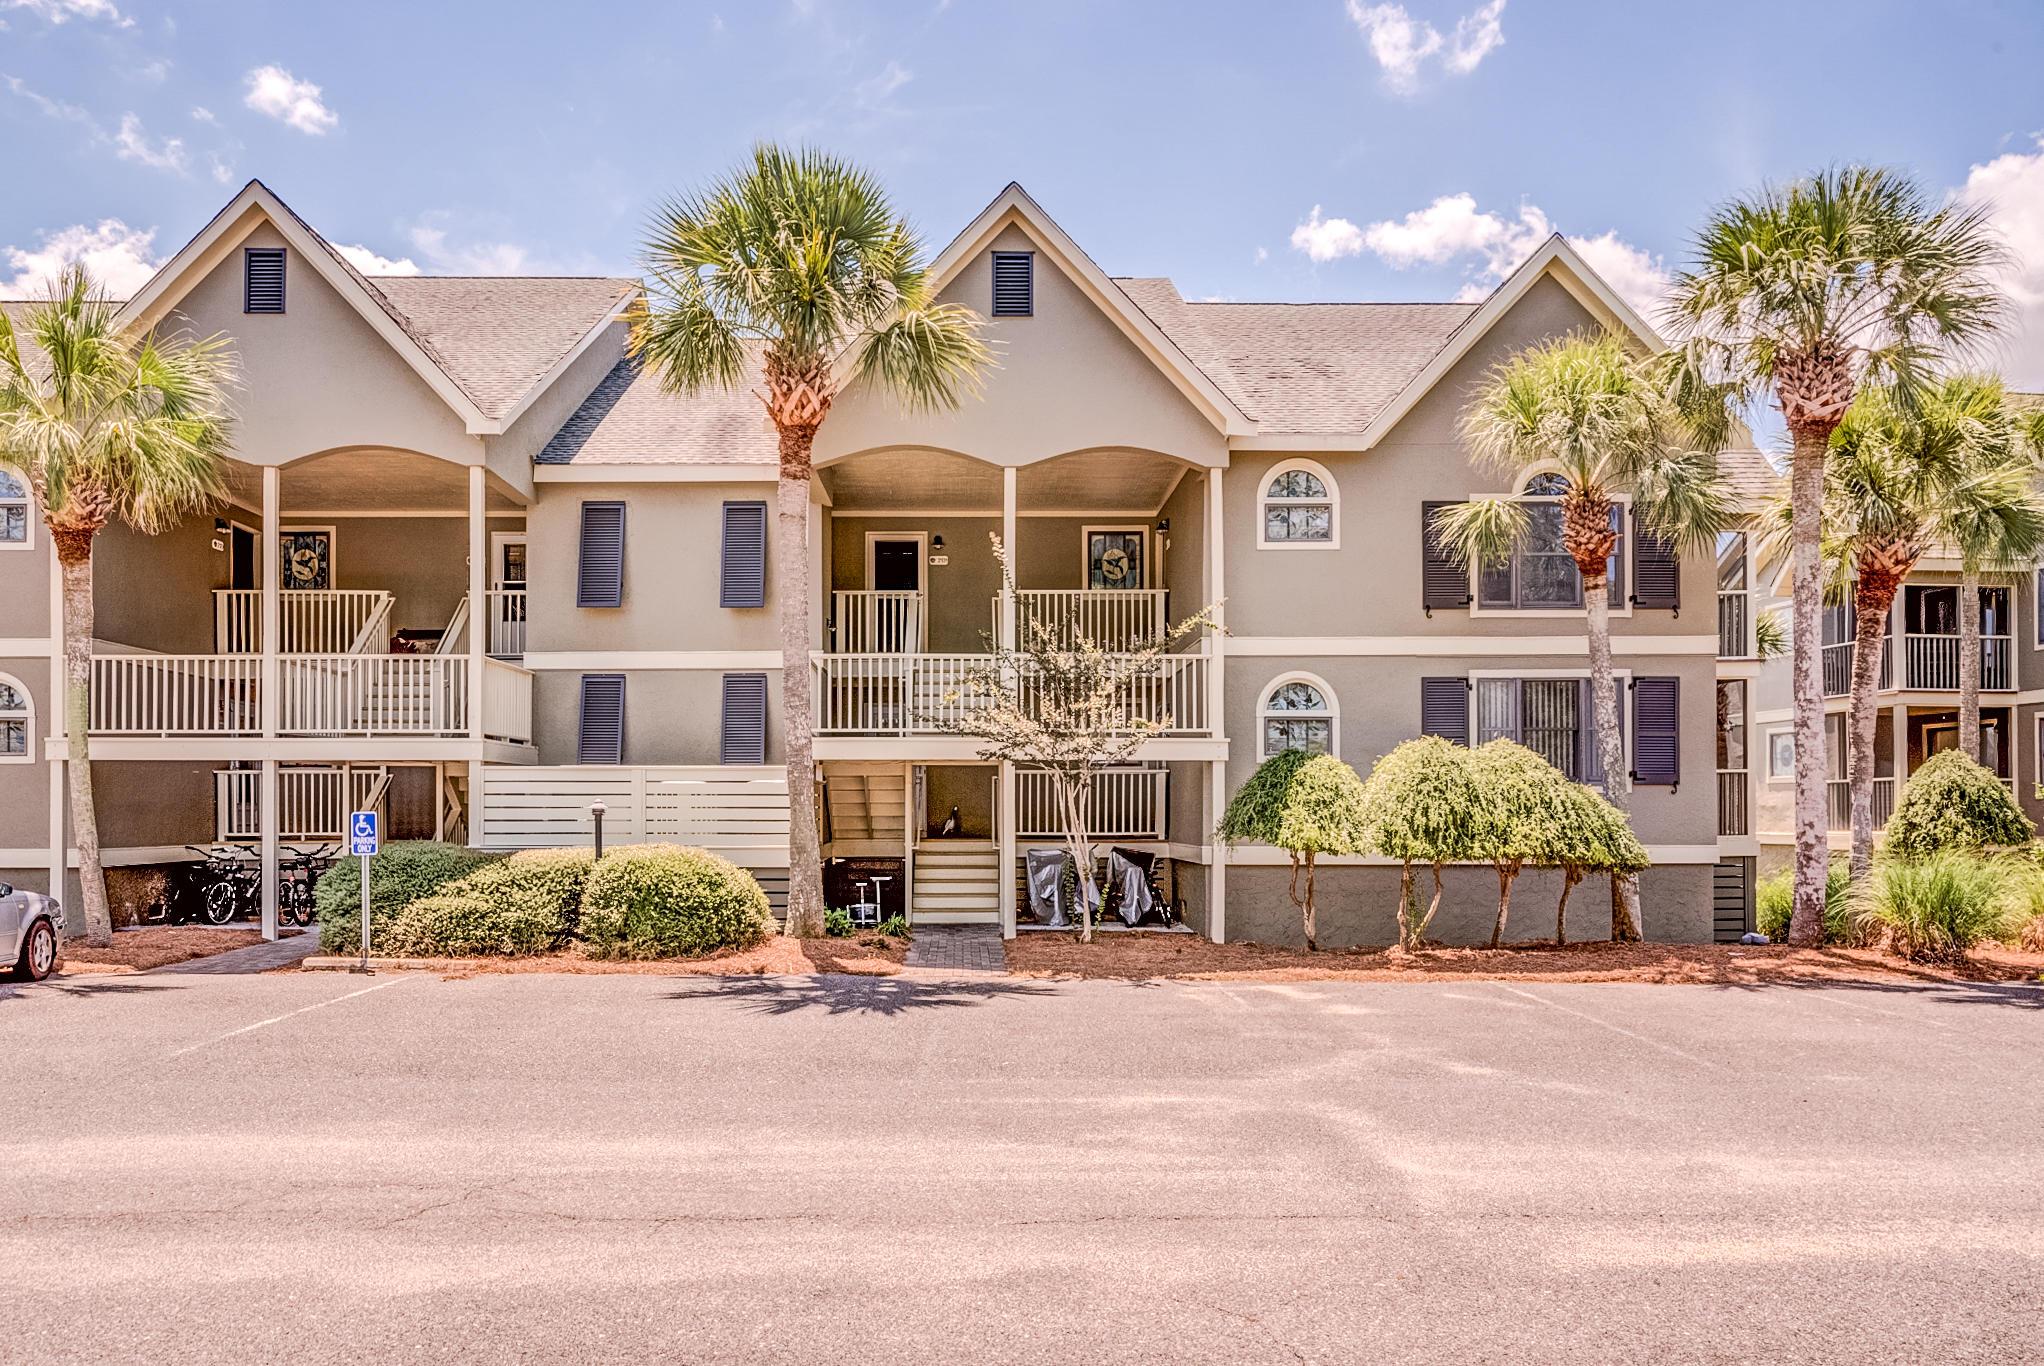 Bay Pointe Villas Homes For Sale - 2127 Landfall, Johns Island, SC - 14